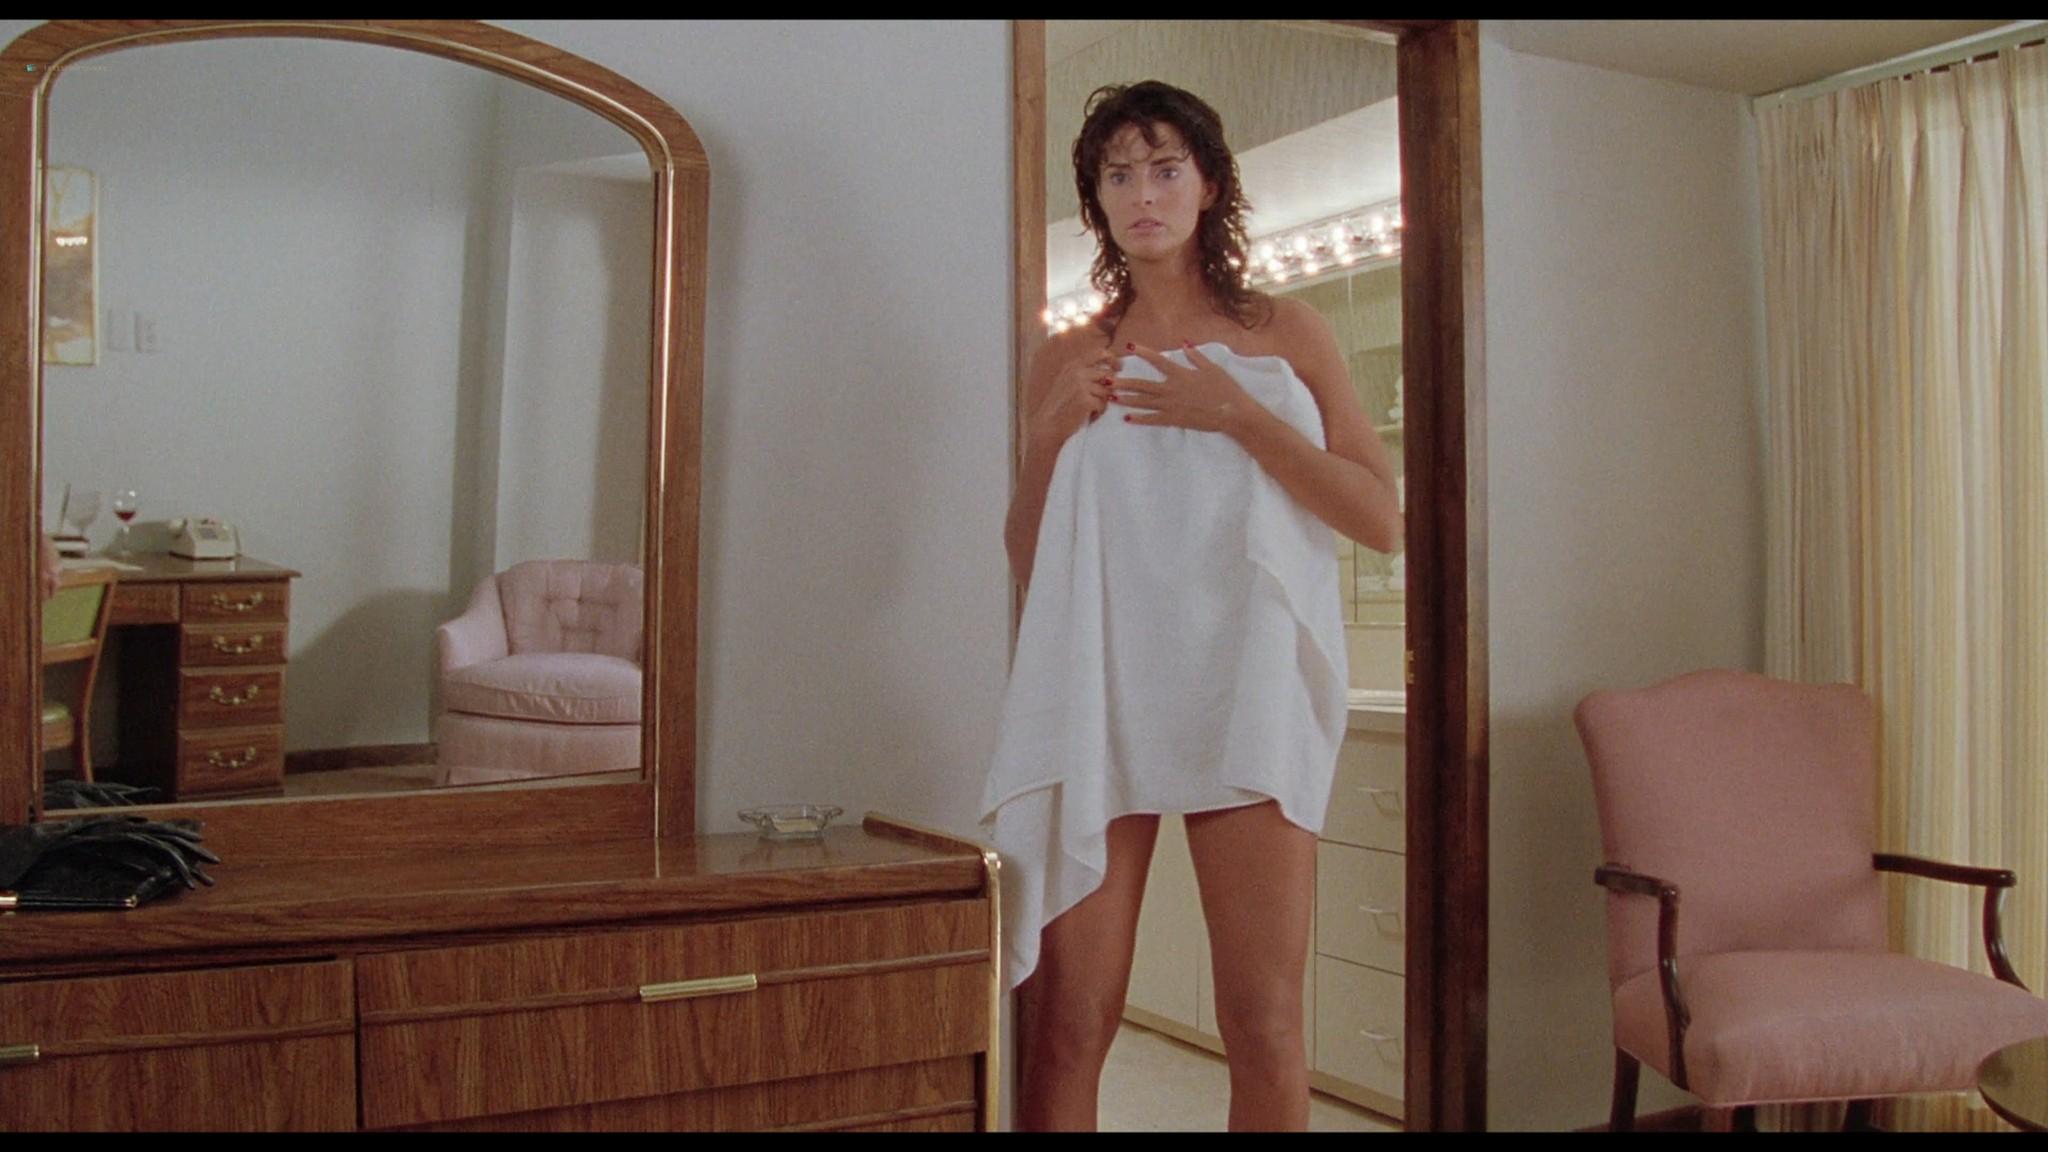 Joan Severance nude topless - See No Evil Hear No Evil (1989) HD 720/1080p (4)